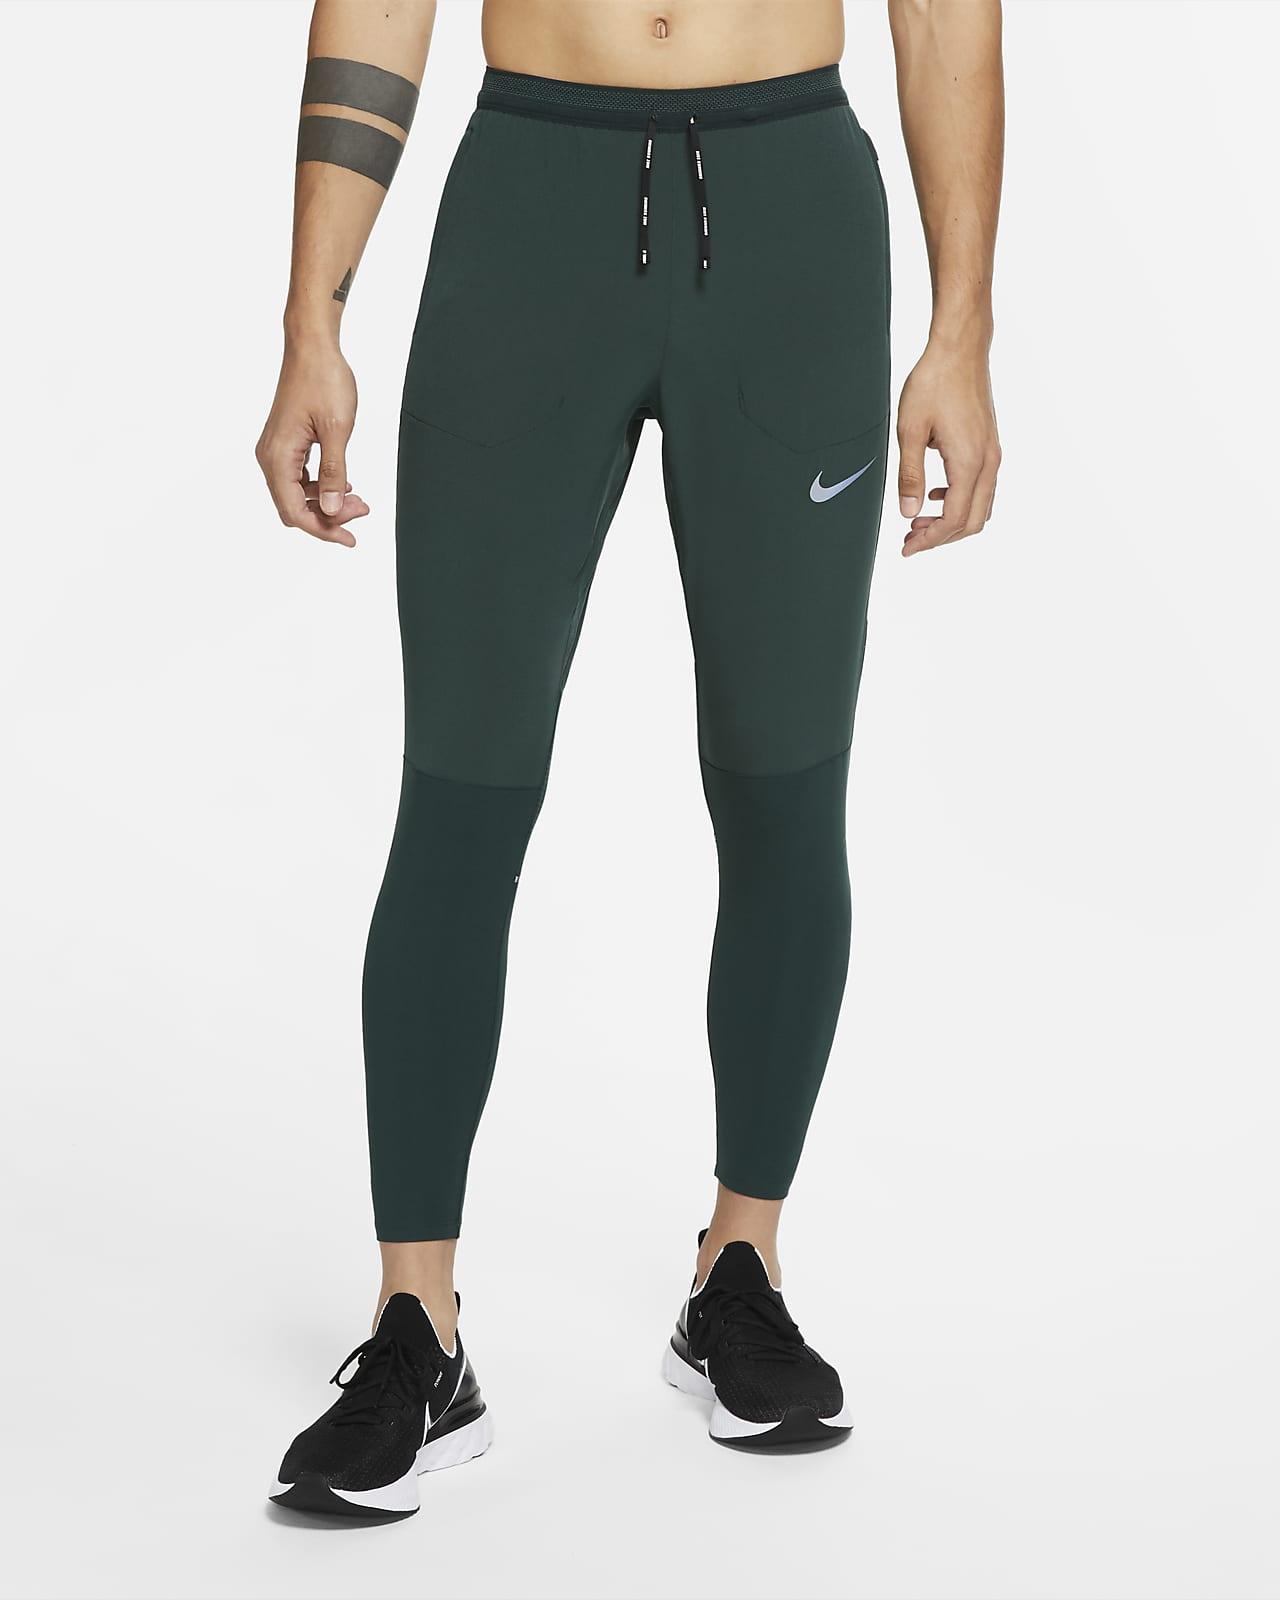 Pantaloni da running Nike Swift - Uomo